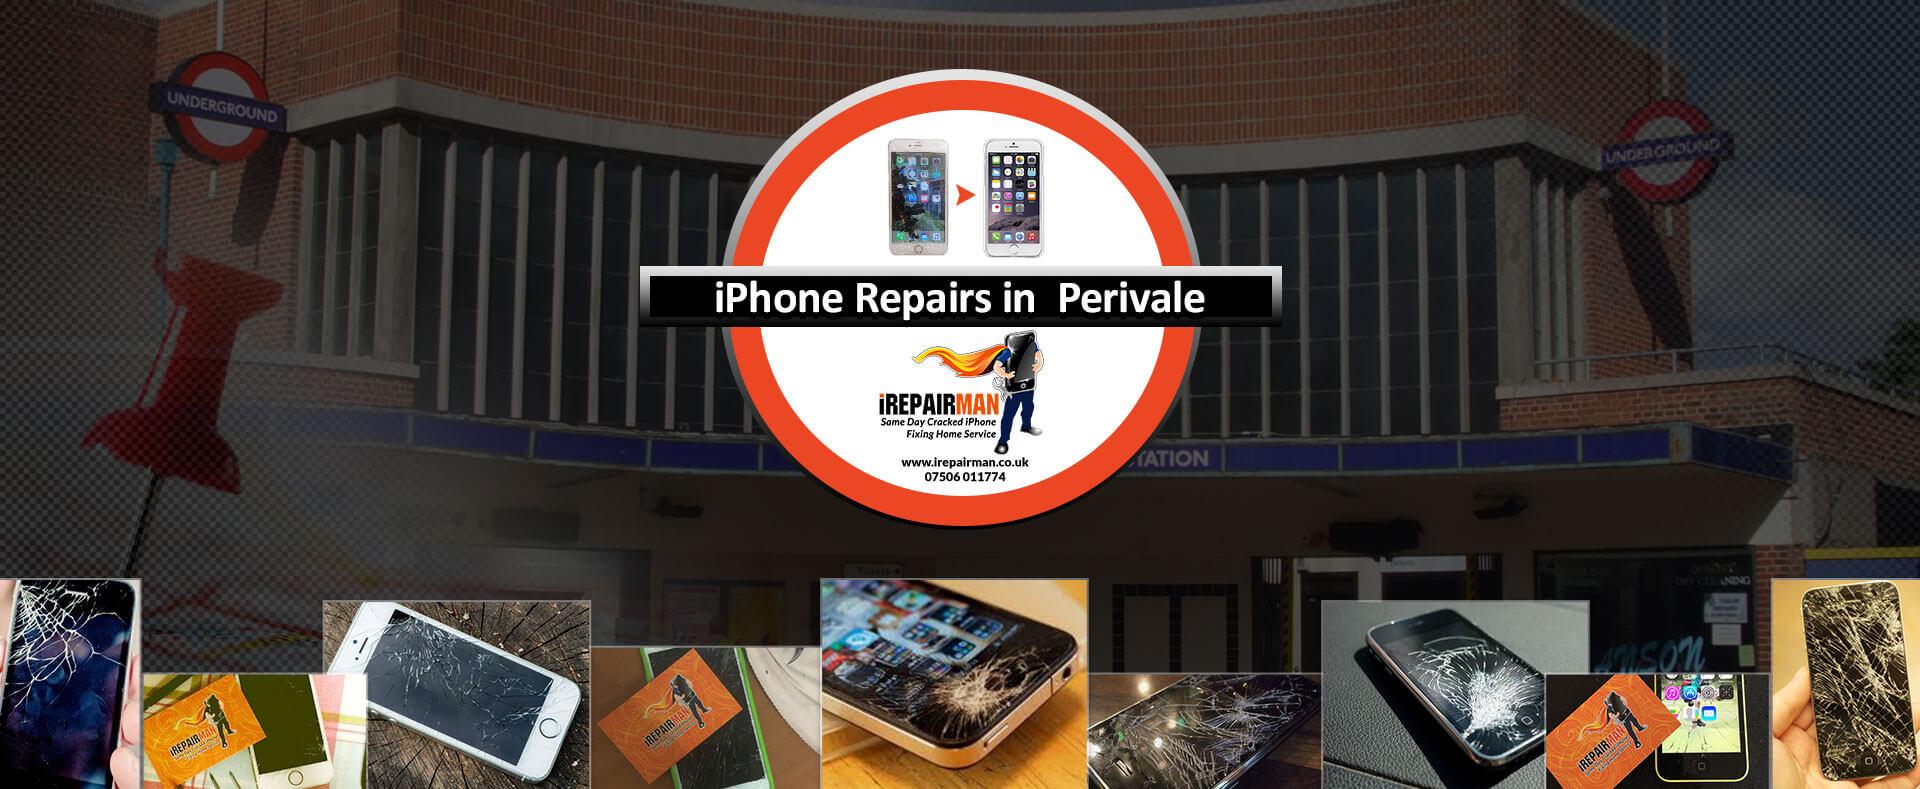 iPhone Repairs in Perivale